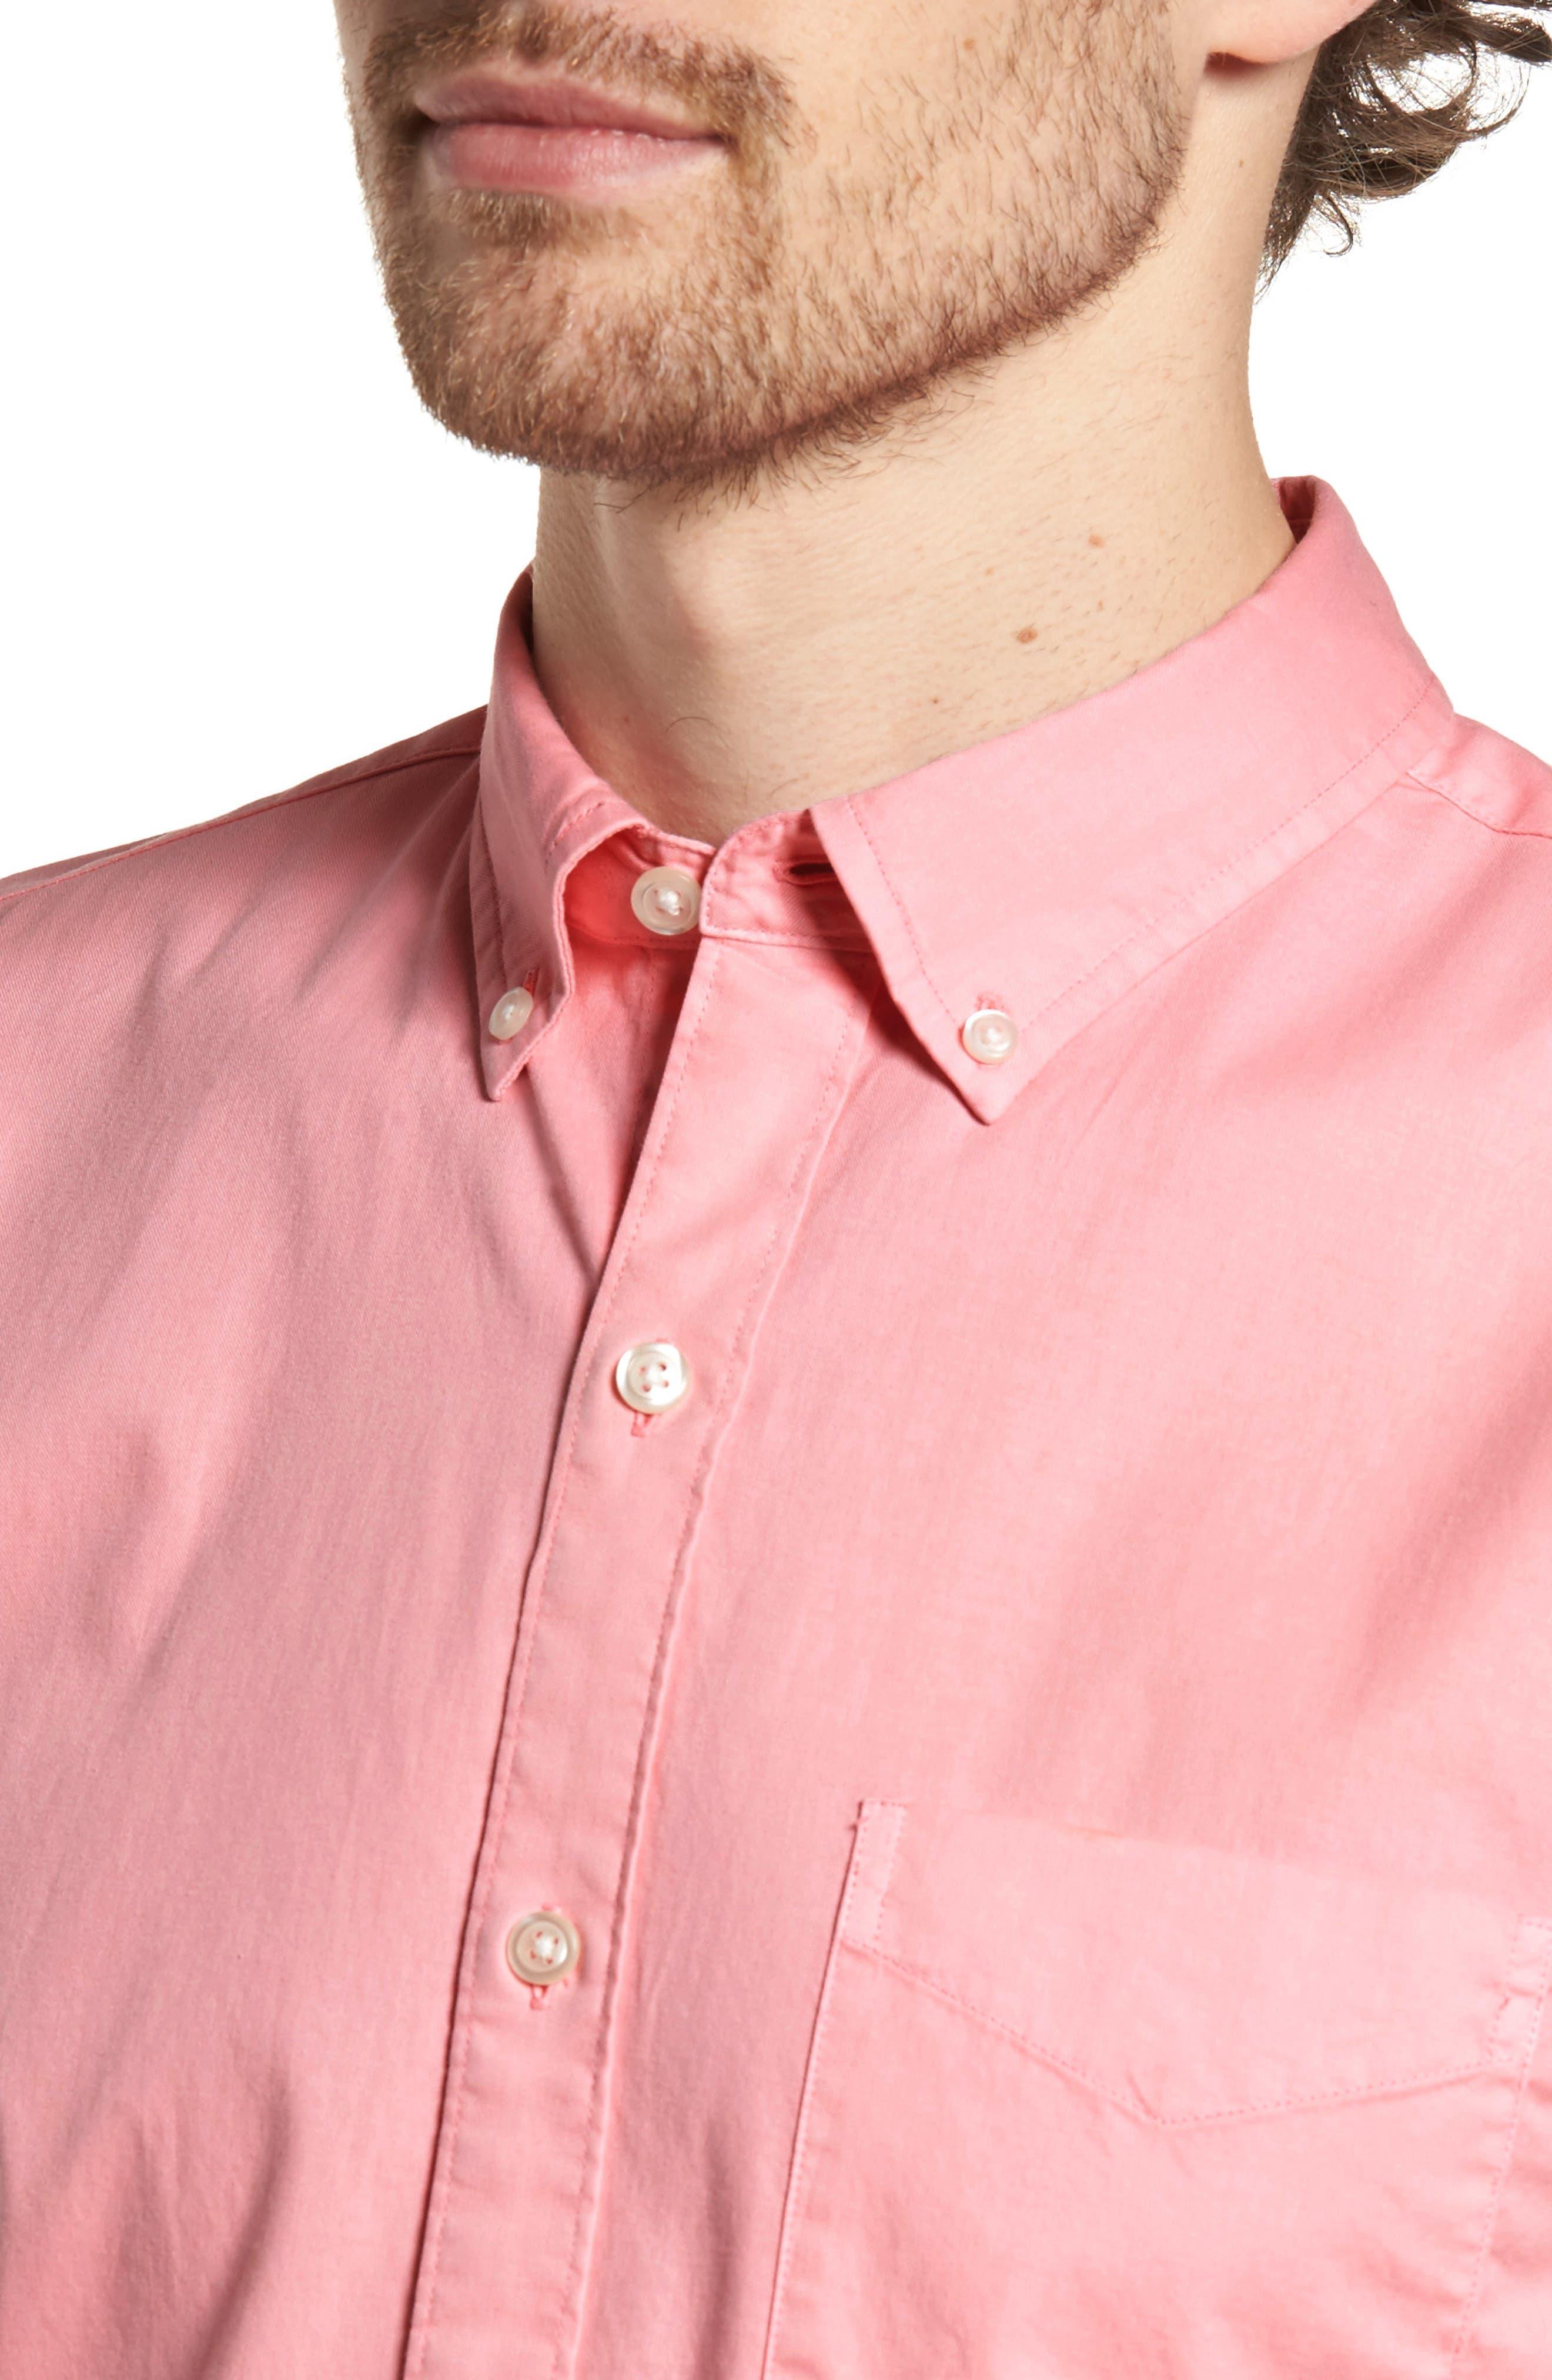 Slim Fit Short Sleeve Sport Shirt,                             Alternate thumbnail 2, color,                             Garment Dye - Pacific Pink